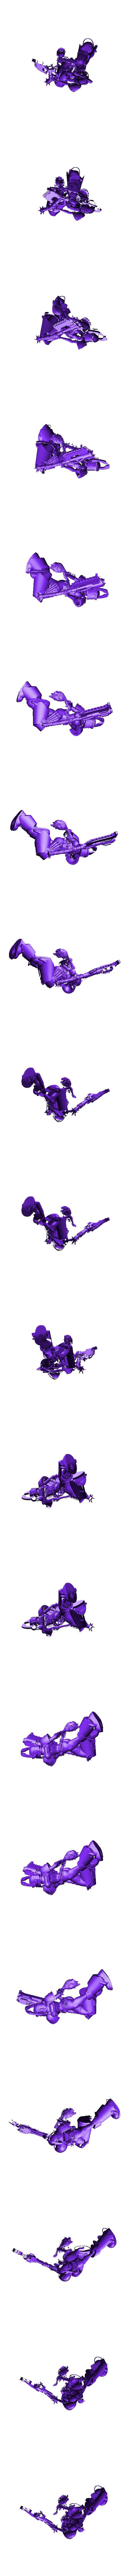 khorne_Sister_4.stl Download free STL file War-Whore #4 • Object to 3D print, jeffwrbelis